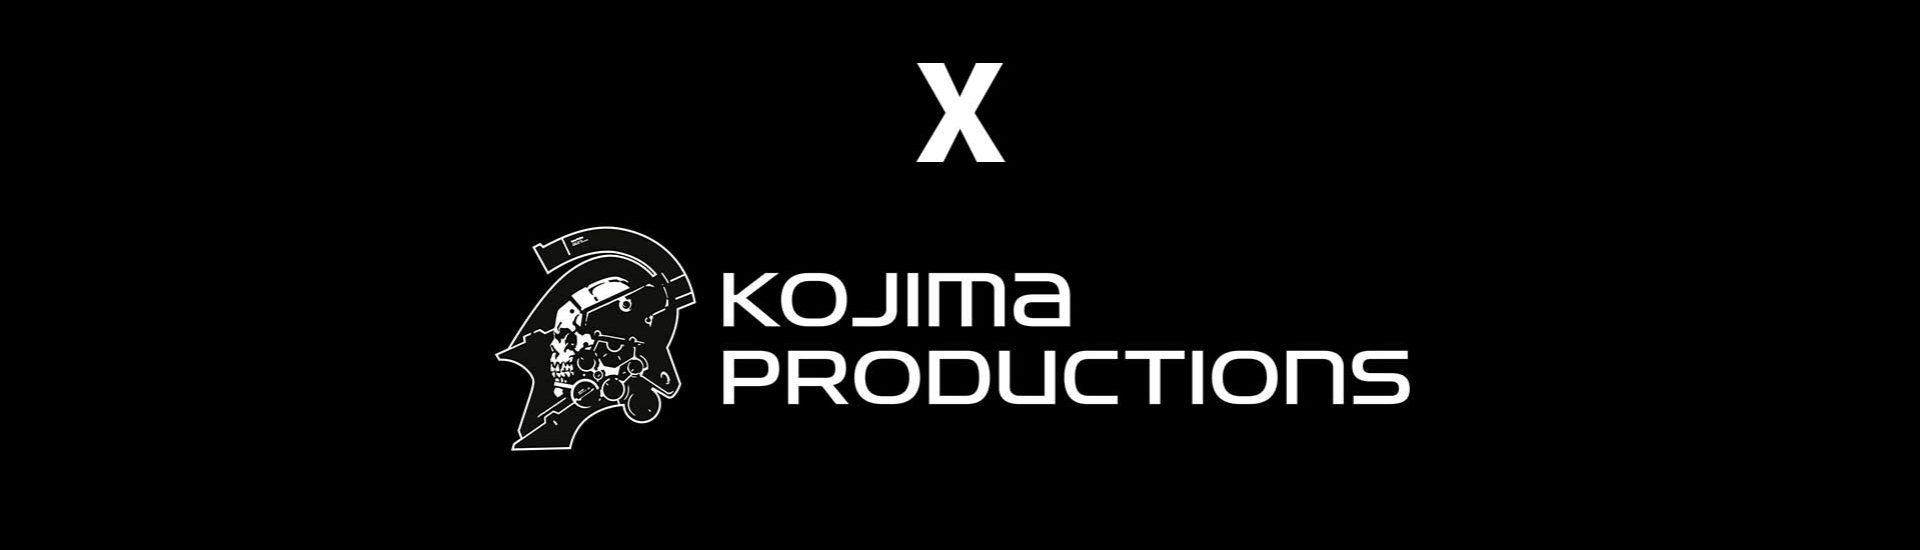 Kojima Productions: Playstation-Fans wollen Projekt durch Petition stoppen